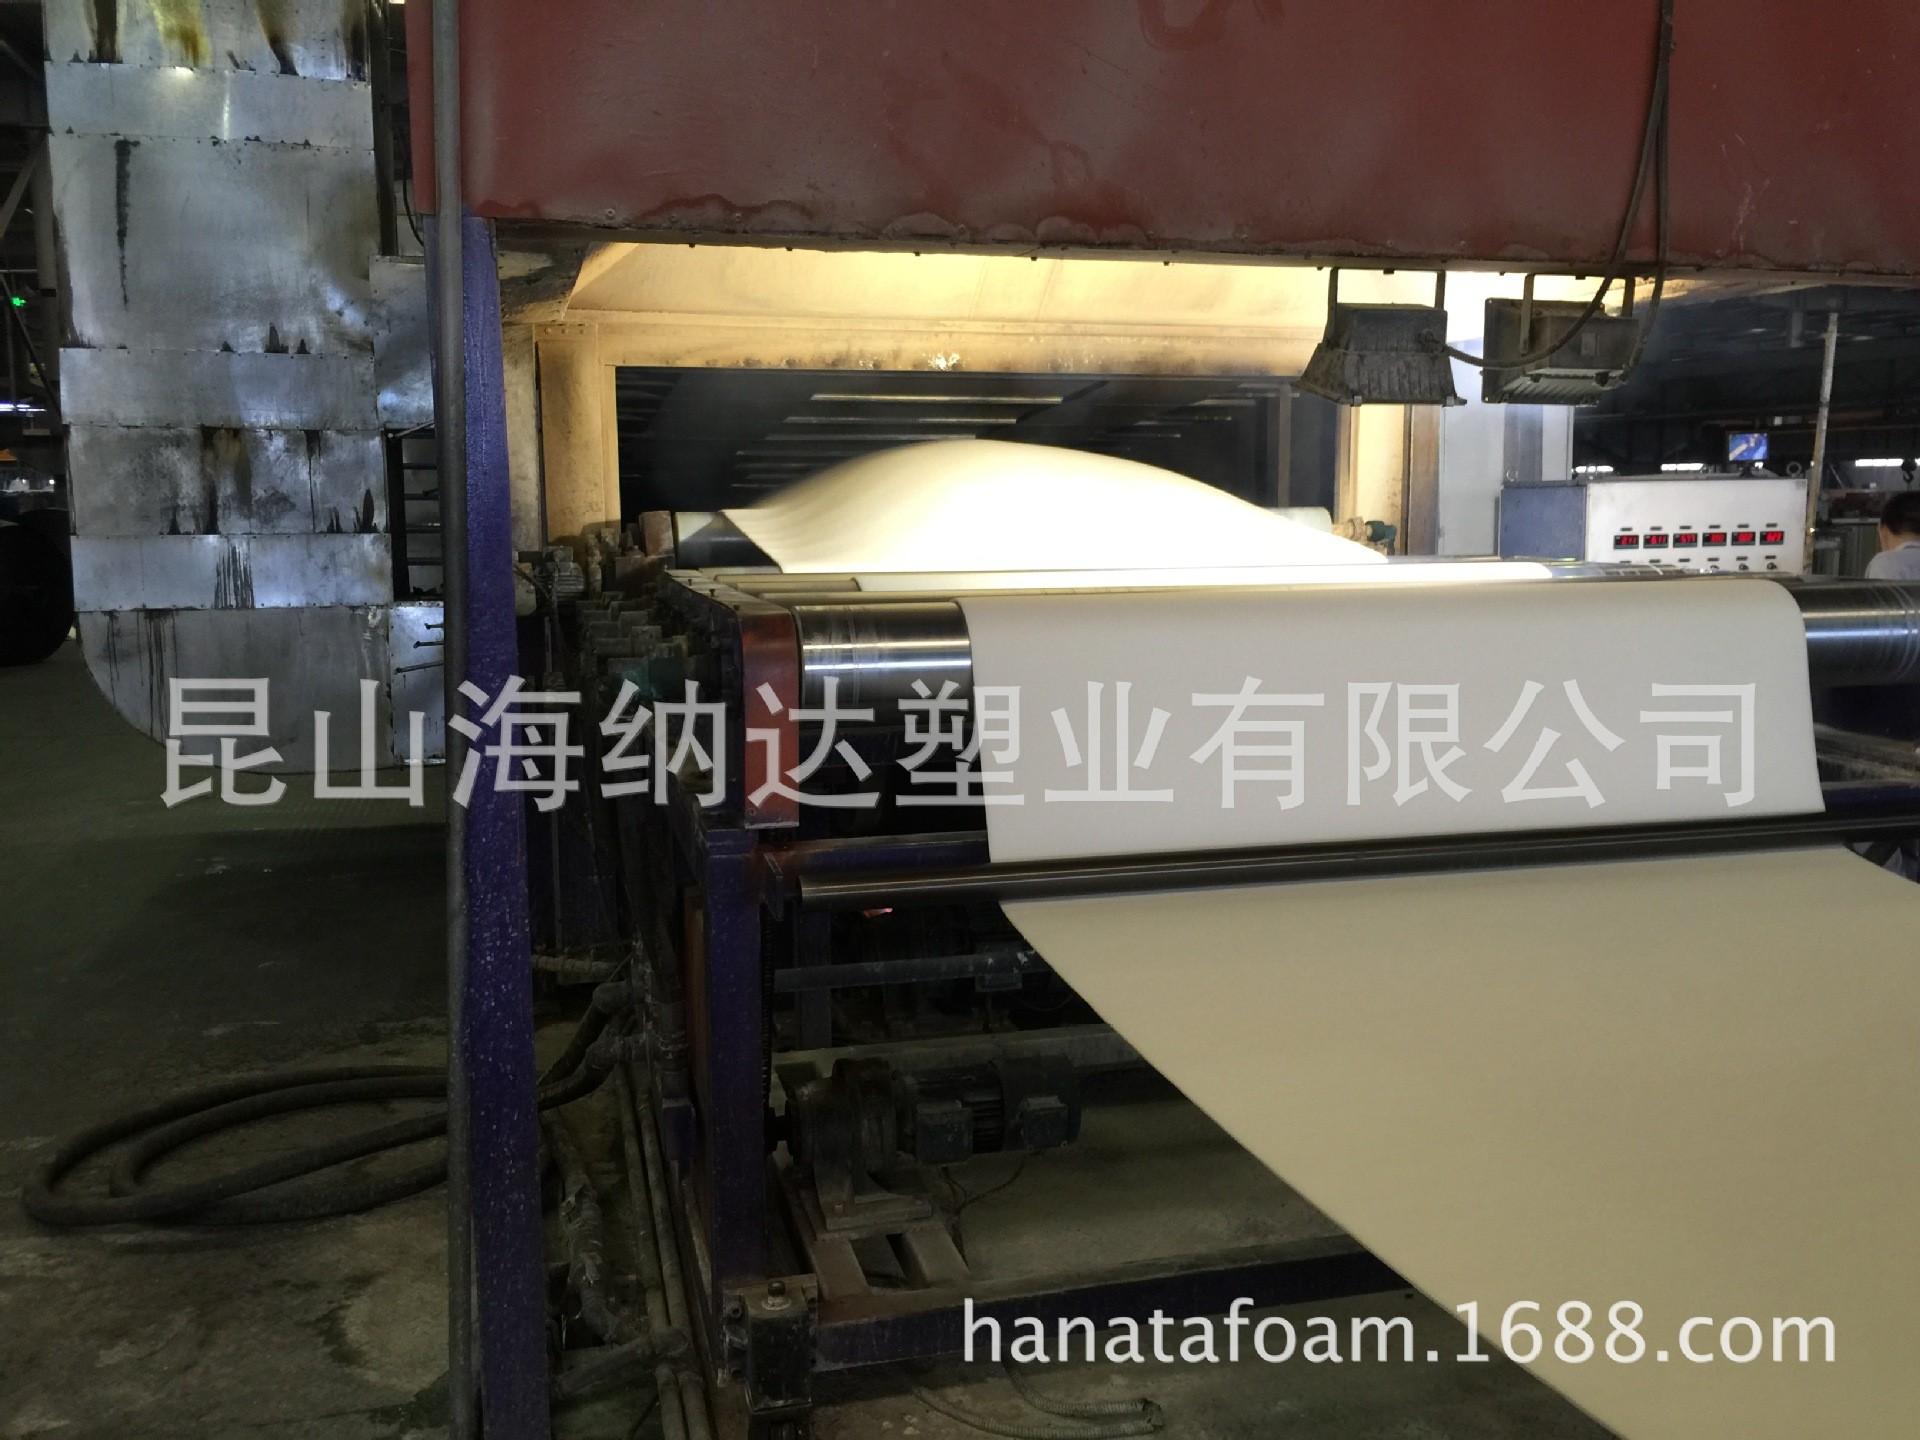 5mm阻燃XPE电子交联泡棉卷材浮筑楼板减震隔音垫防潮保温发泡资料